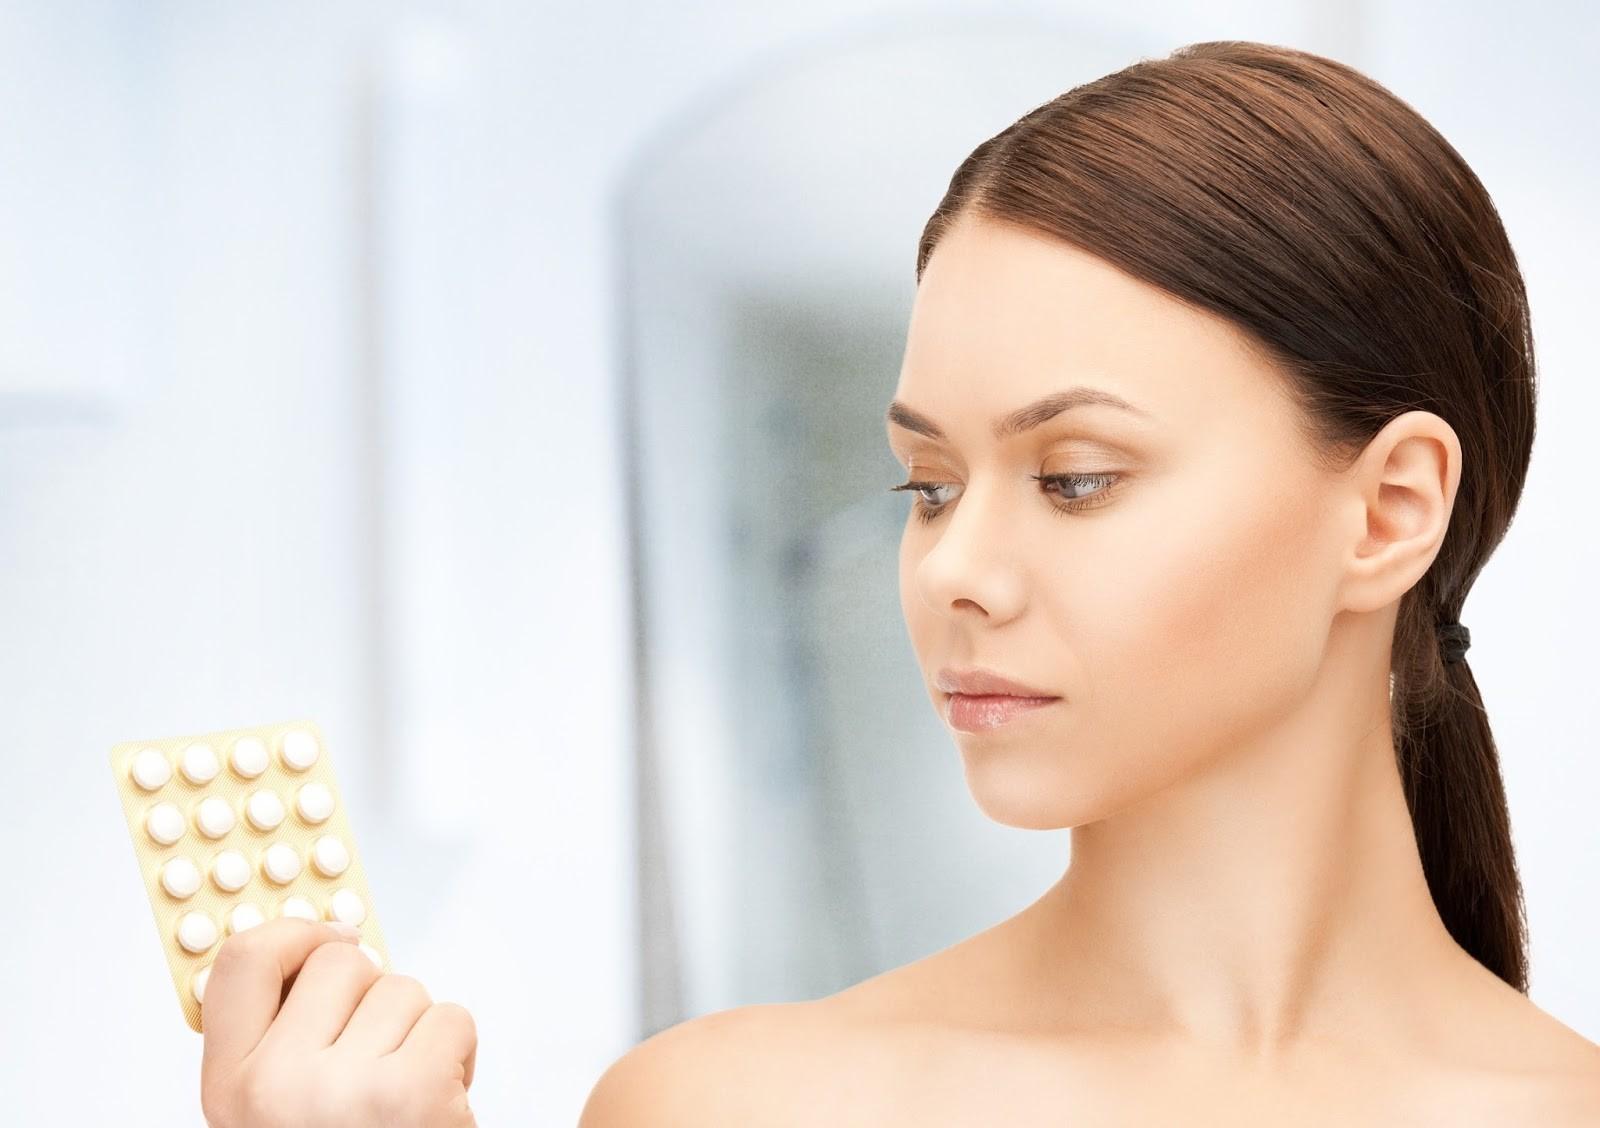 Trị mụn bằng thuốc ngừa thai Diane 35 có an toàn?